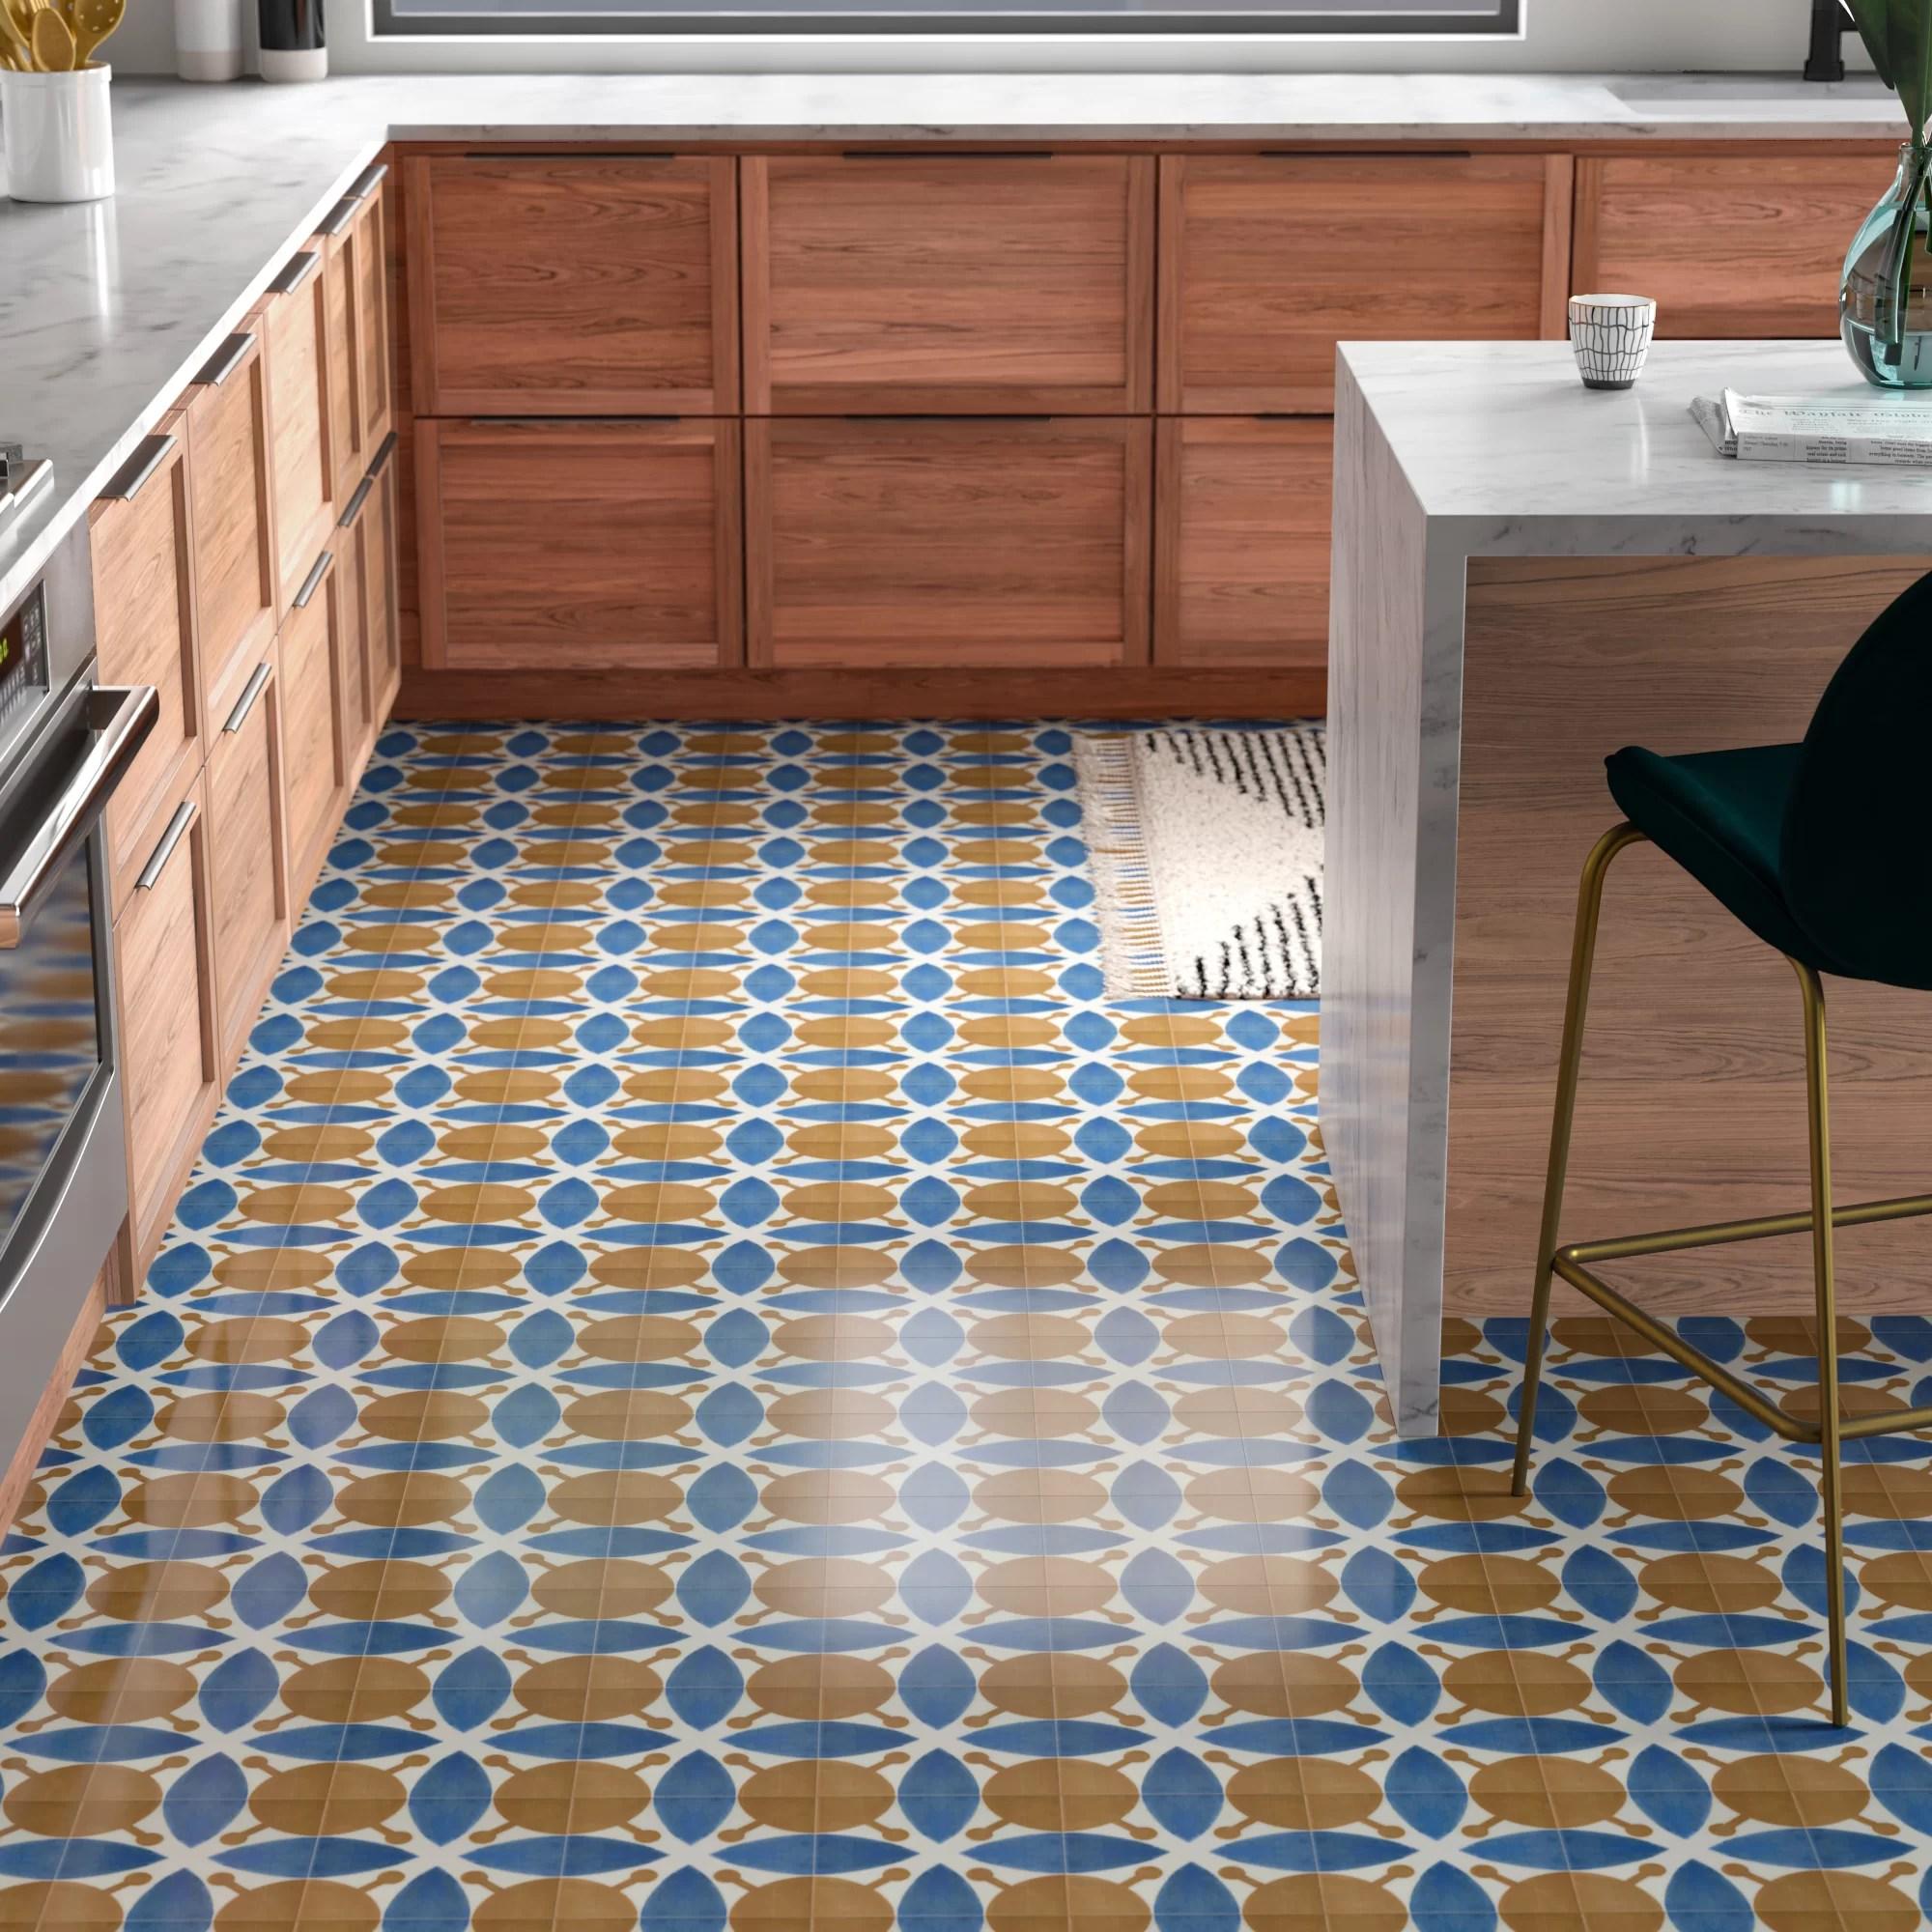 wes 8 x 8 ceramic field tile